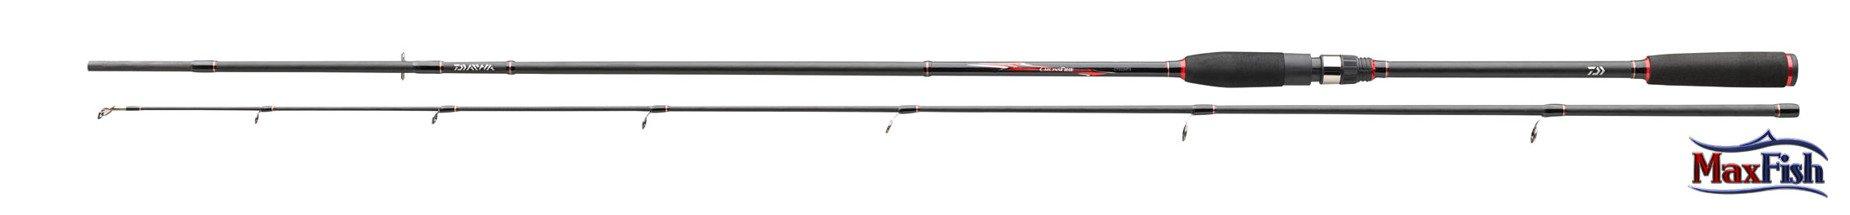 Daiwa Crossfire Jiggerspin  240cm 8-35g